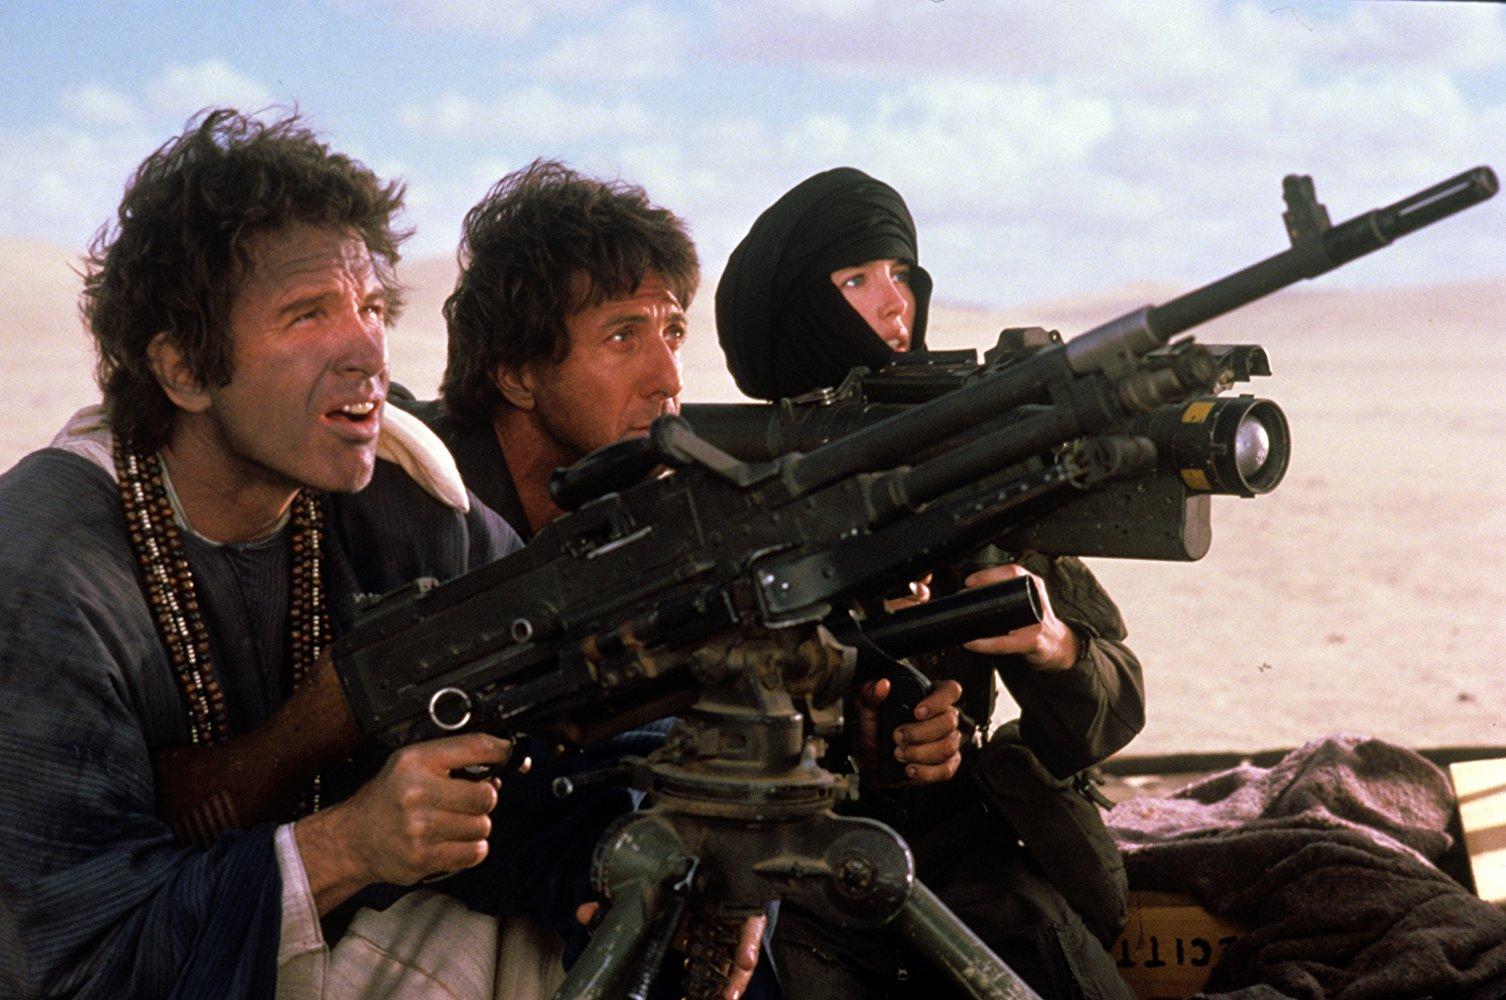 Warren Beatty, Dustin Hoffman, and Isabelle Adjani in ISHTAR (1987)